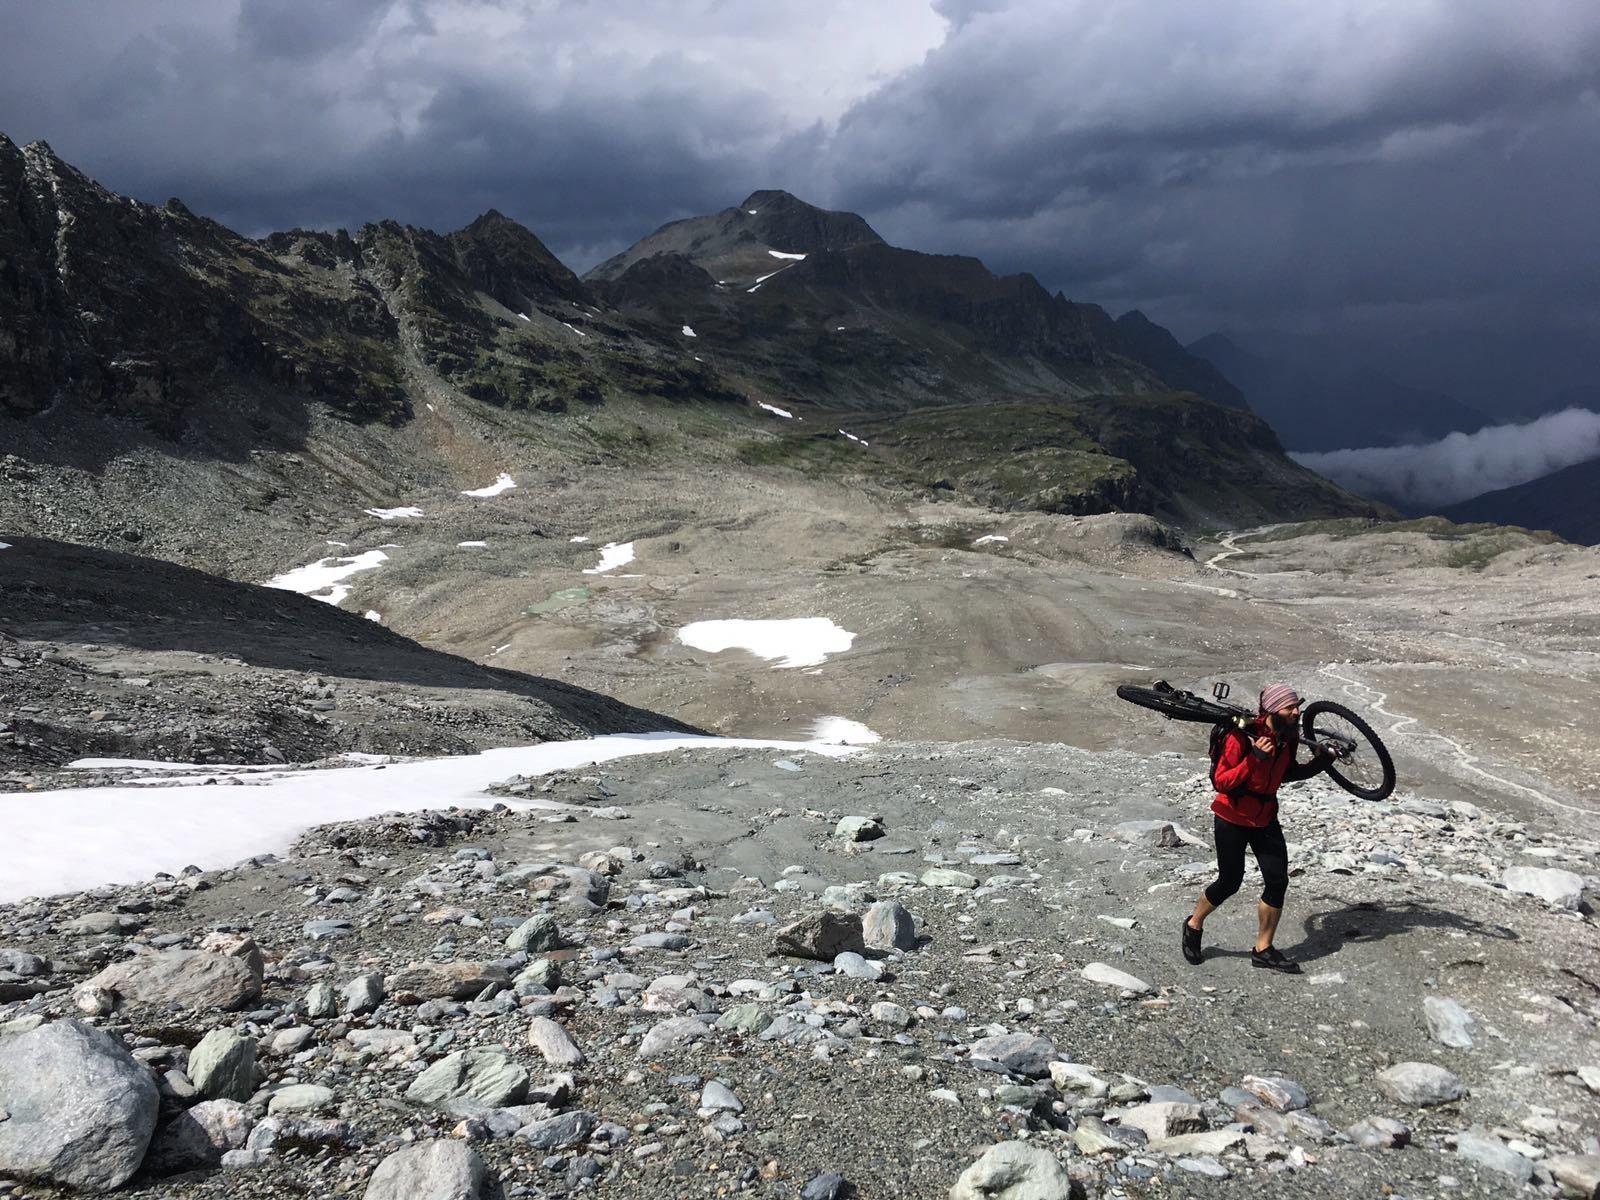 Arnas (Colle d') traversata Val di Susa - Valli di Lanzo - Moncenisio (3 gg) 2017-07-30